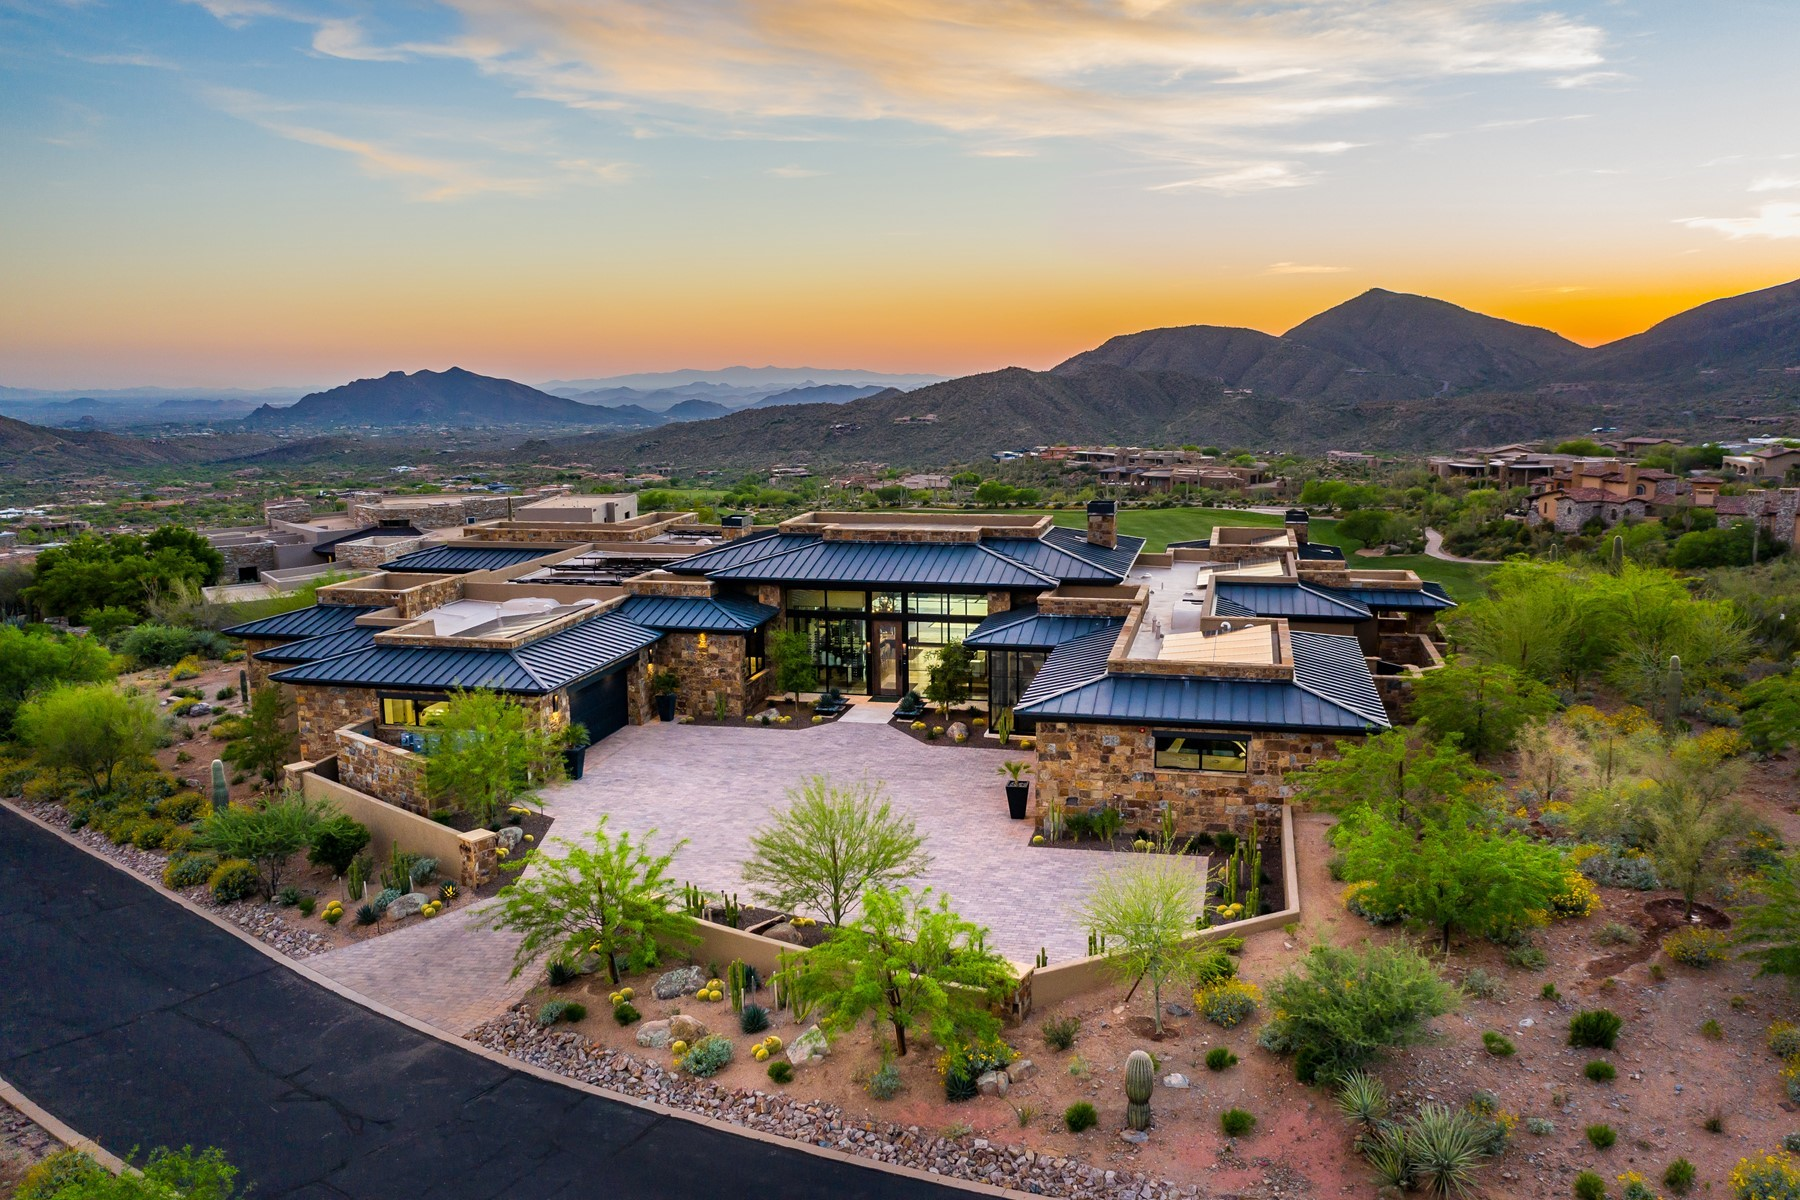 Single Family Homes por un Venta en Saguaro Forest 236 42250 N 102ND ST Scottsdale, Arizona 85262 Estados Unidos